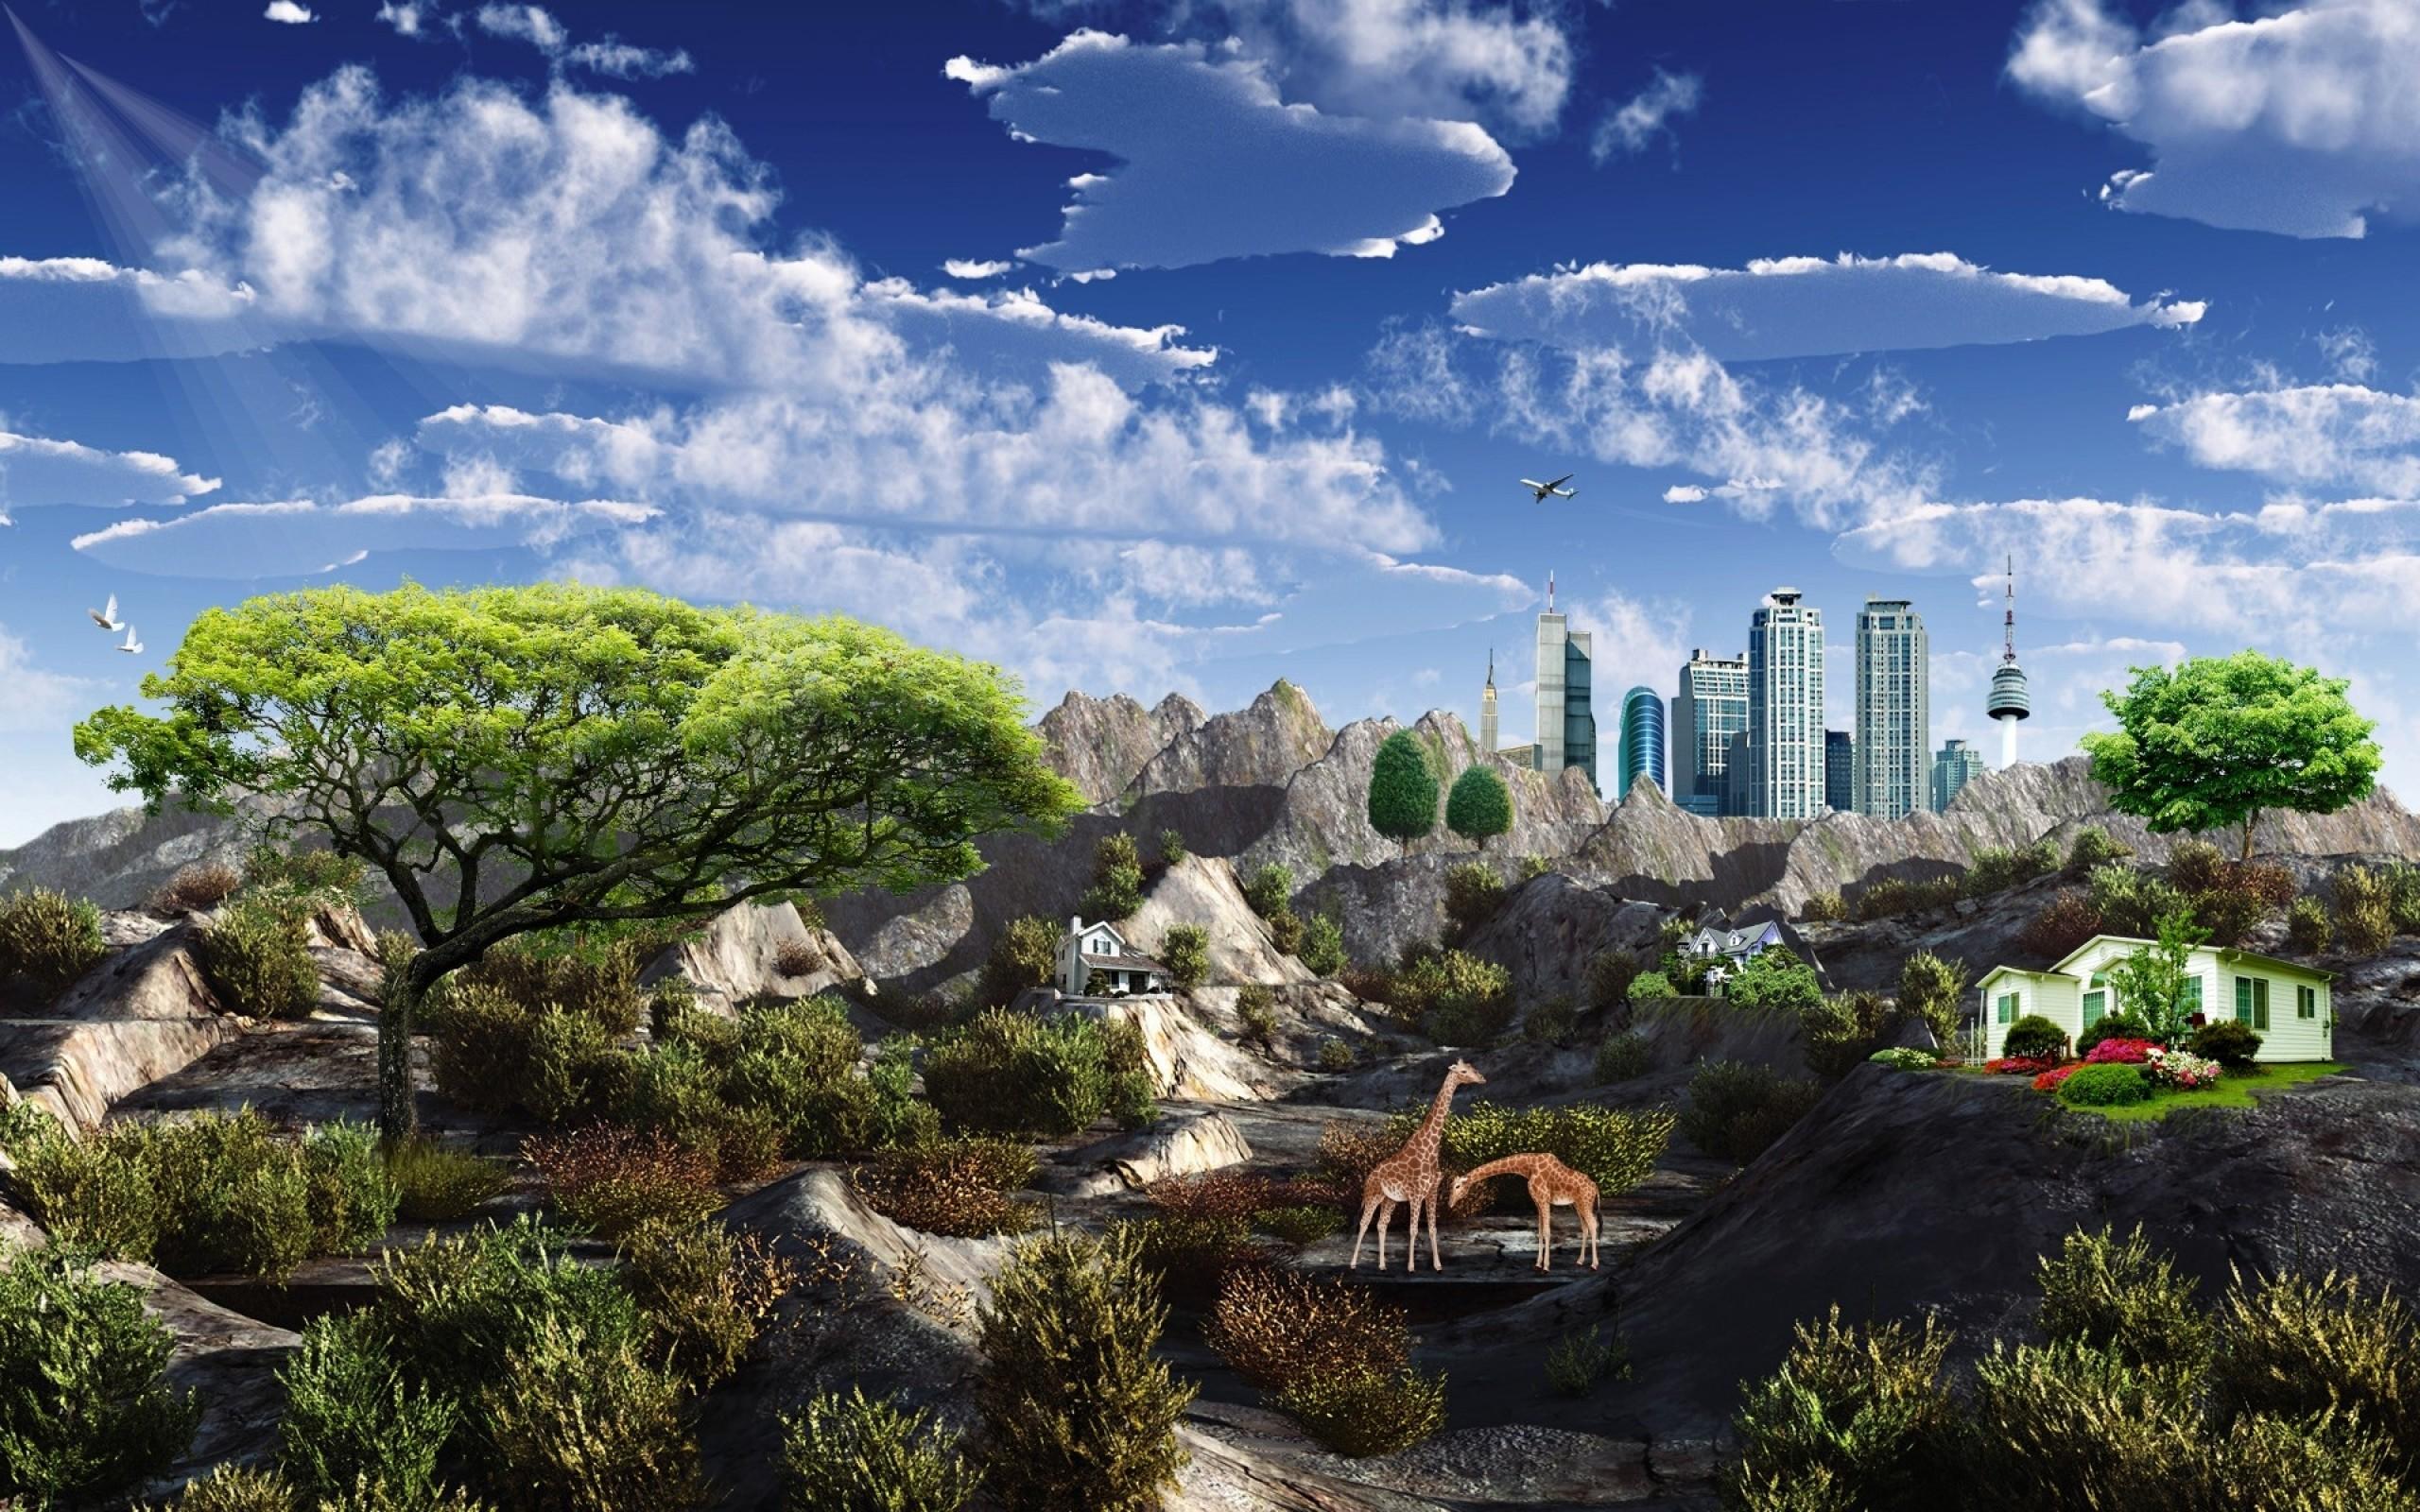 landscapes digital art alien landscapes 1920×1200 wallpaper Art HD Wallpaper